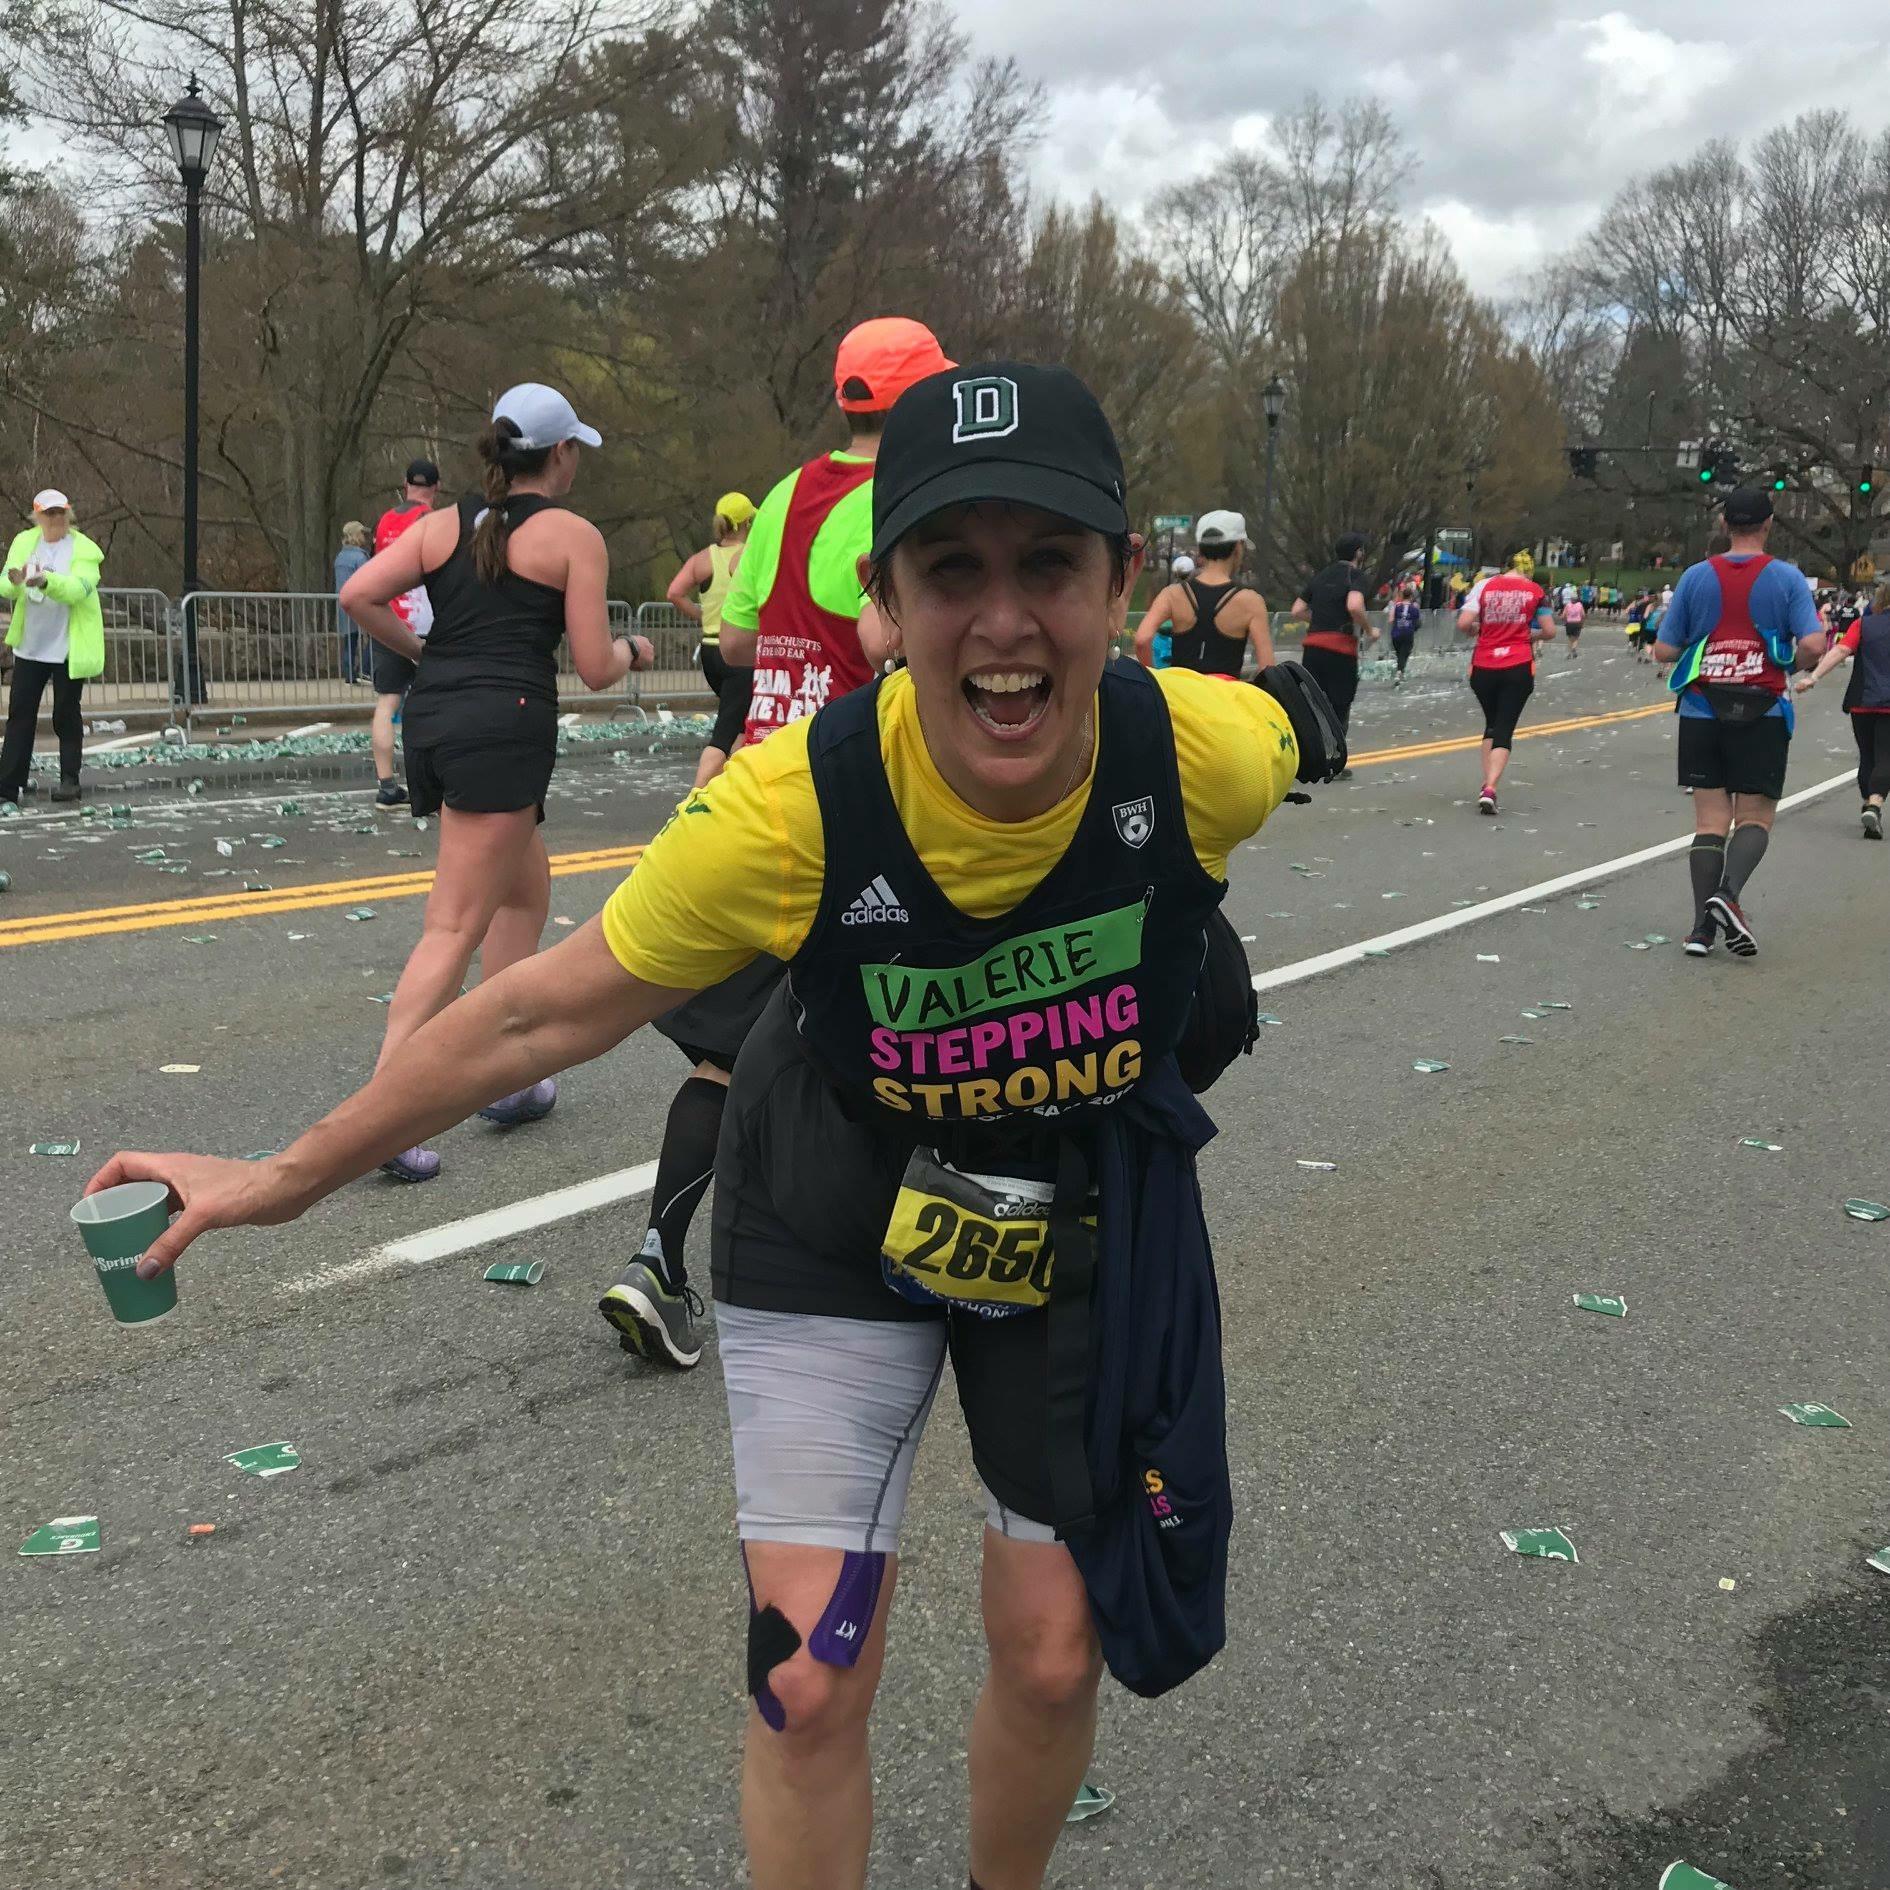 What a thrill! Running my 2nd Marathon-2019 B.A.A. Boston Marathon